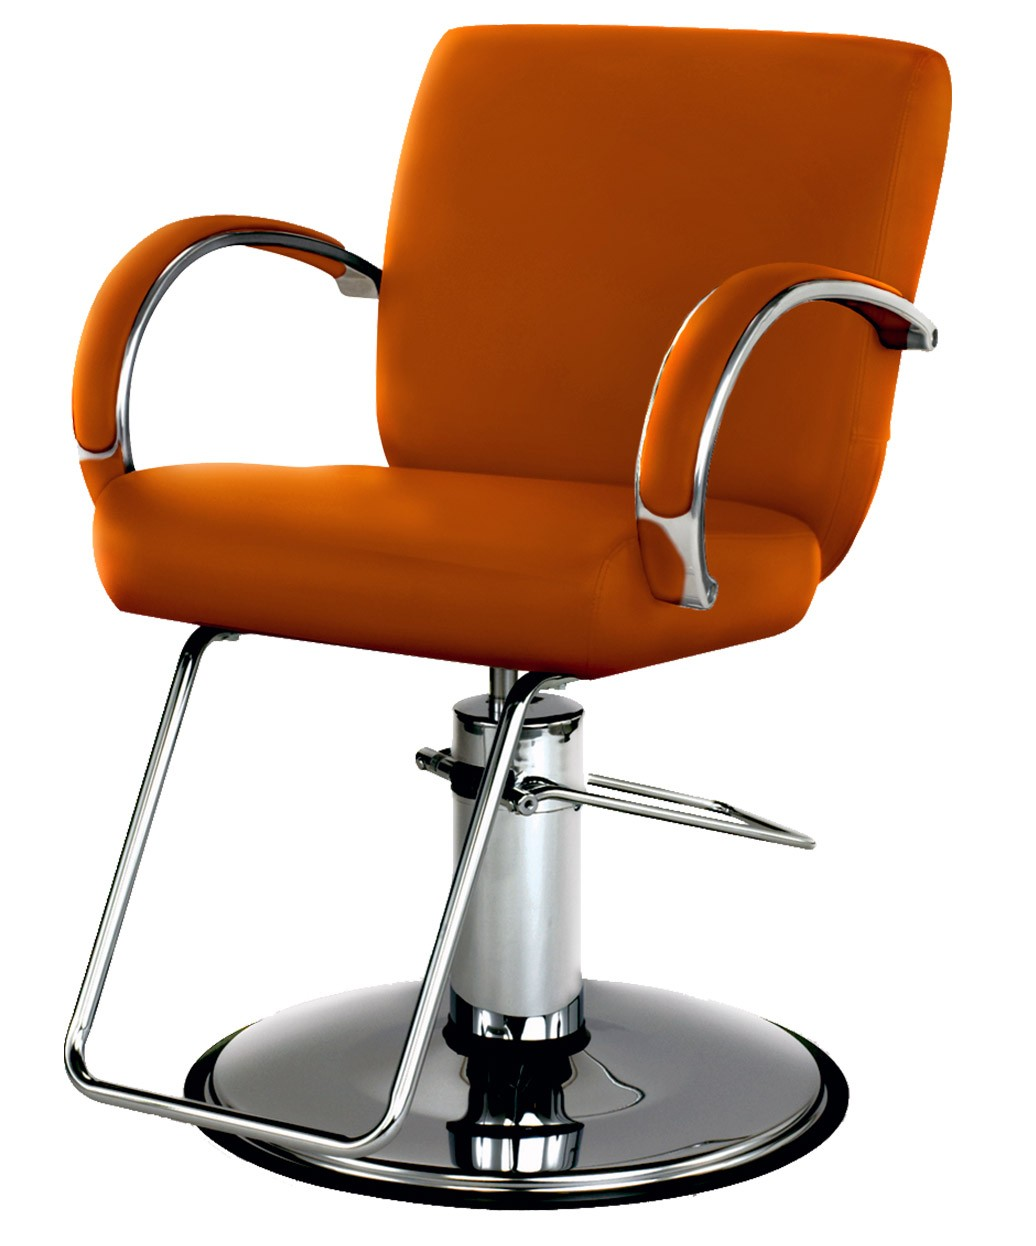 Belmont barber chair - Belmont Barber Chair 15